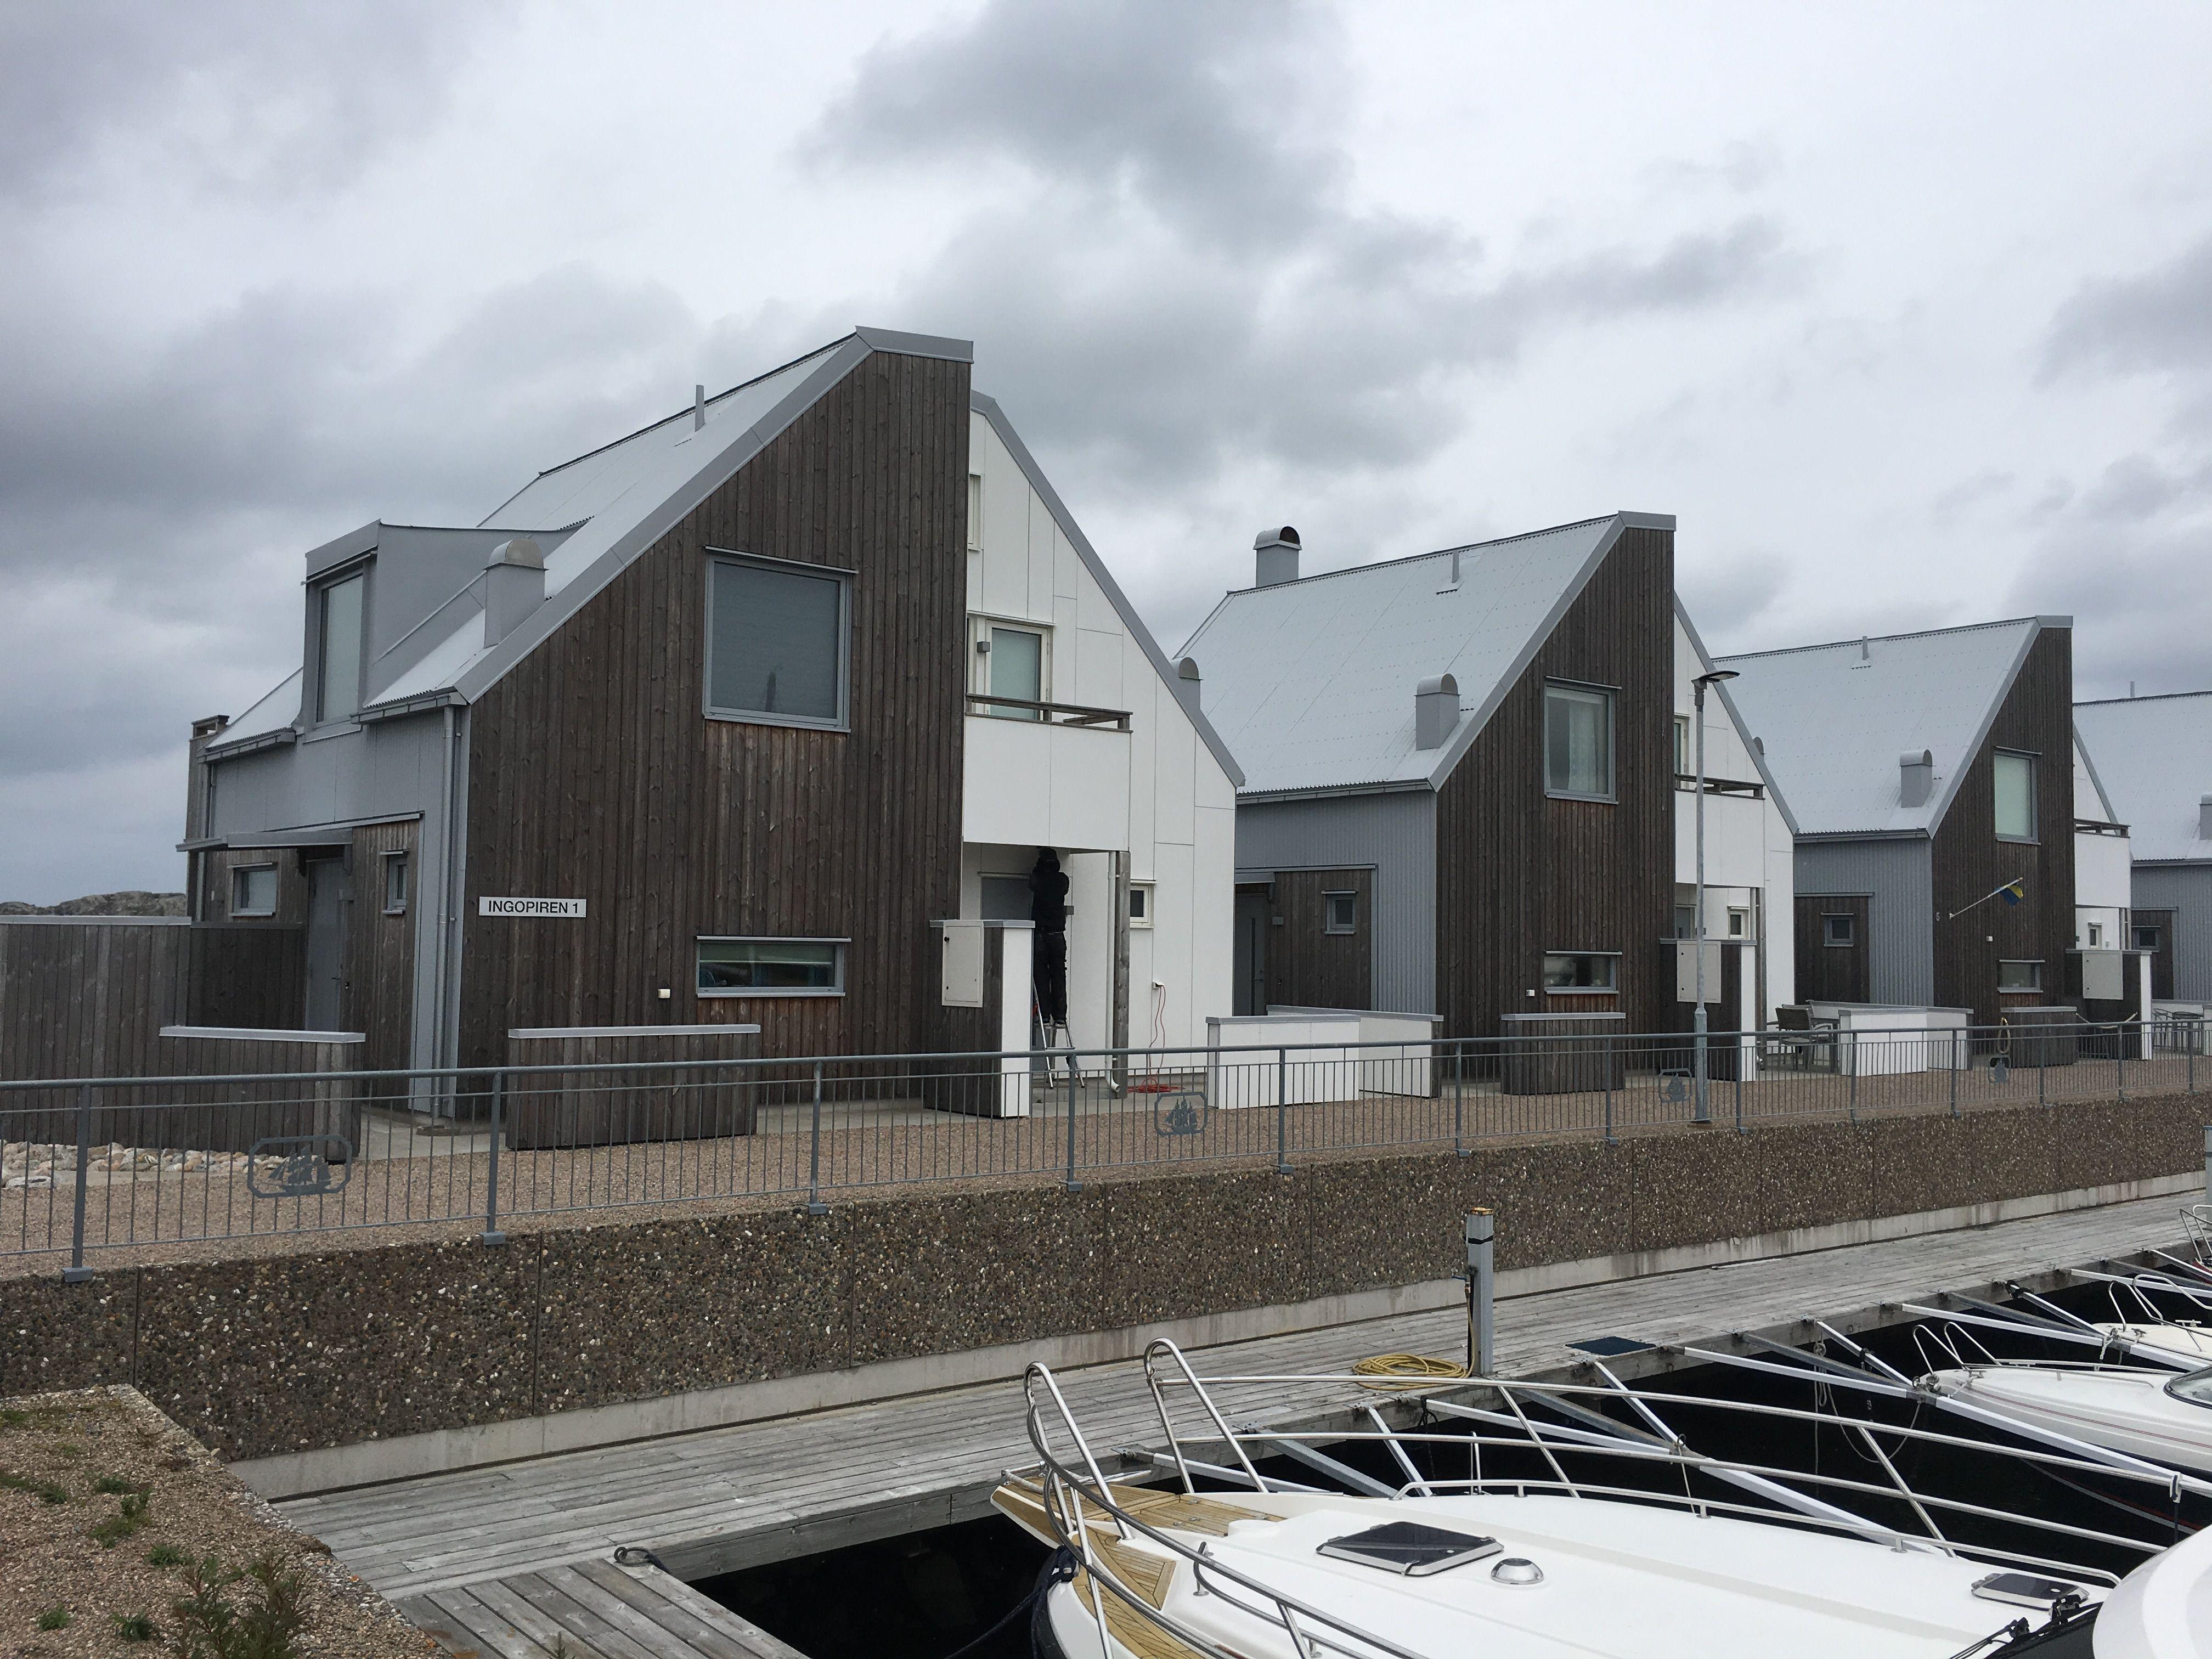 Kv Ingo, Mats & Arne Arkitektkontor